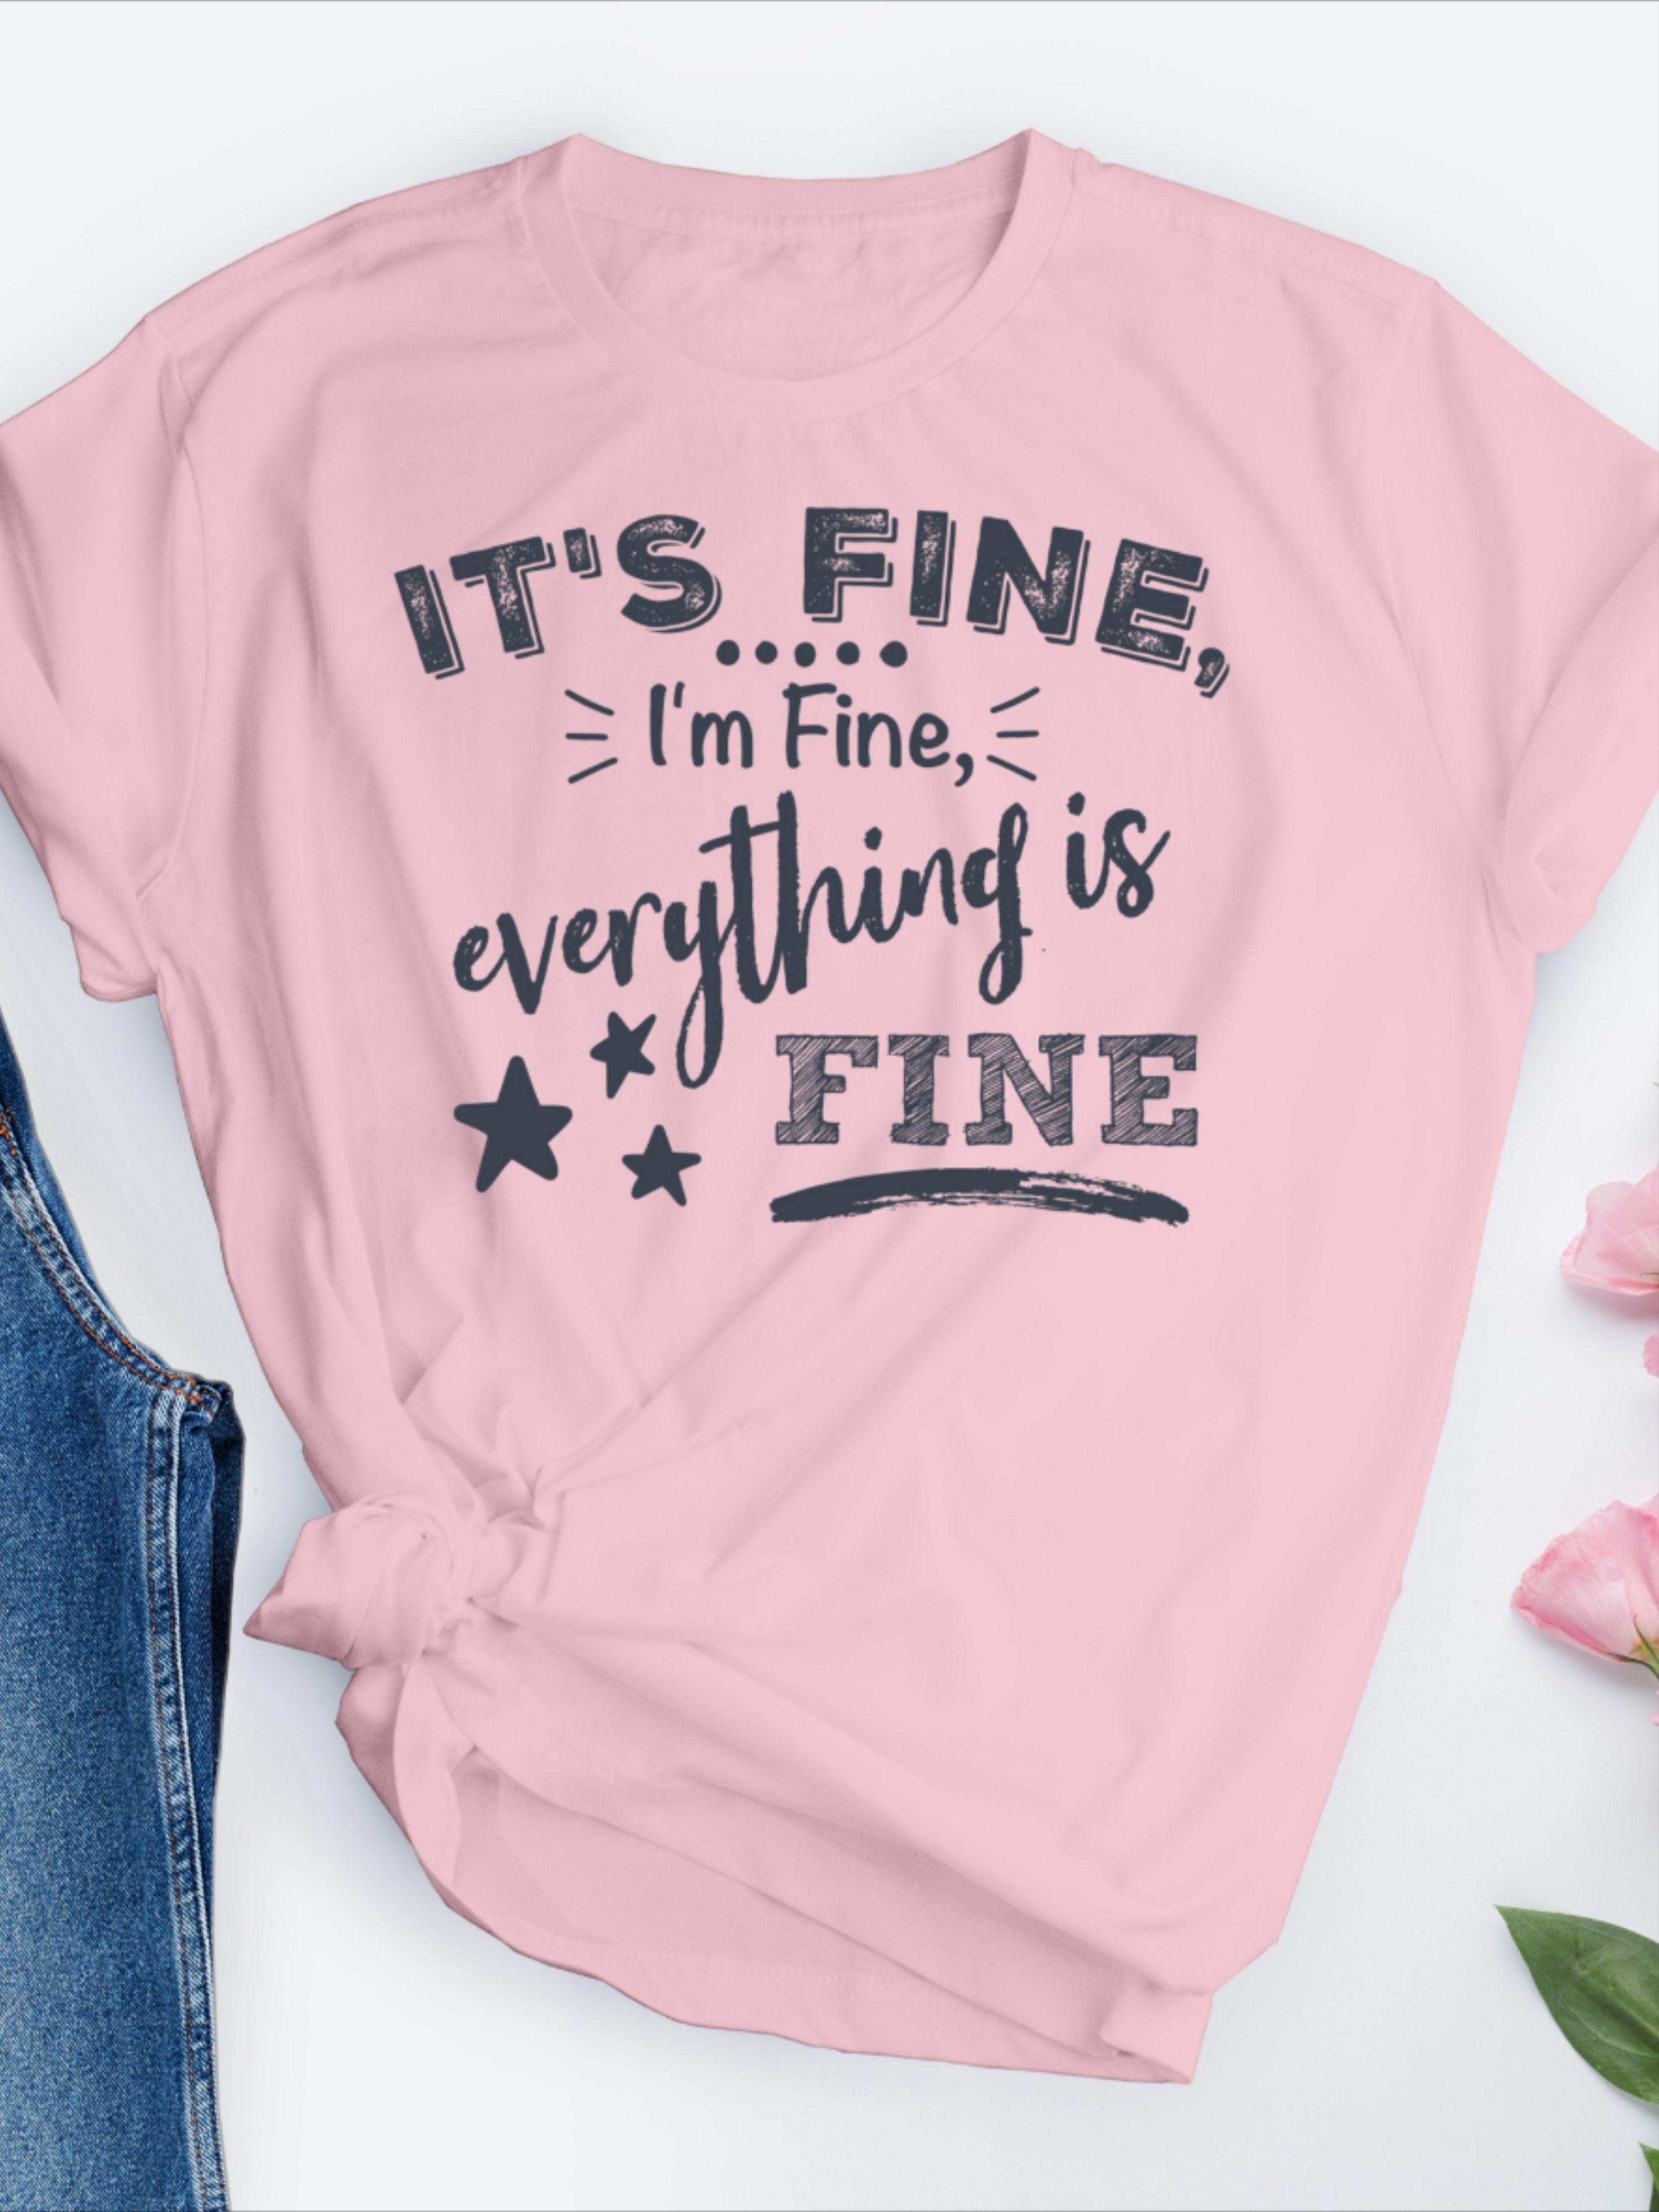 Funny Saying T-shirt Short-Sleeve Women/'s T-Shirt It/'s fine I/'m fine Everything/'s fine T-shirt Sarcastic women/'s shirt